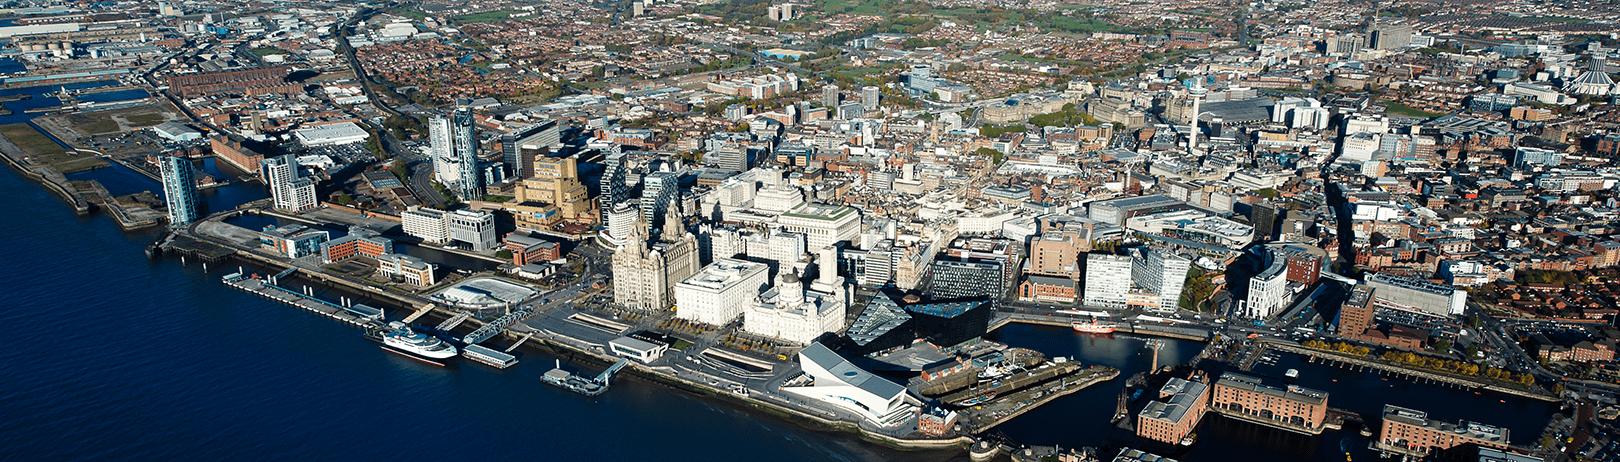 Merseyside Dock